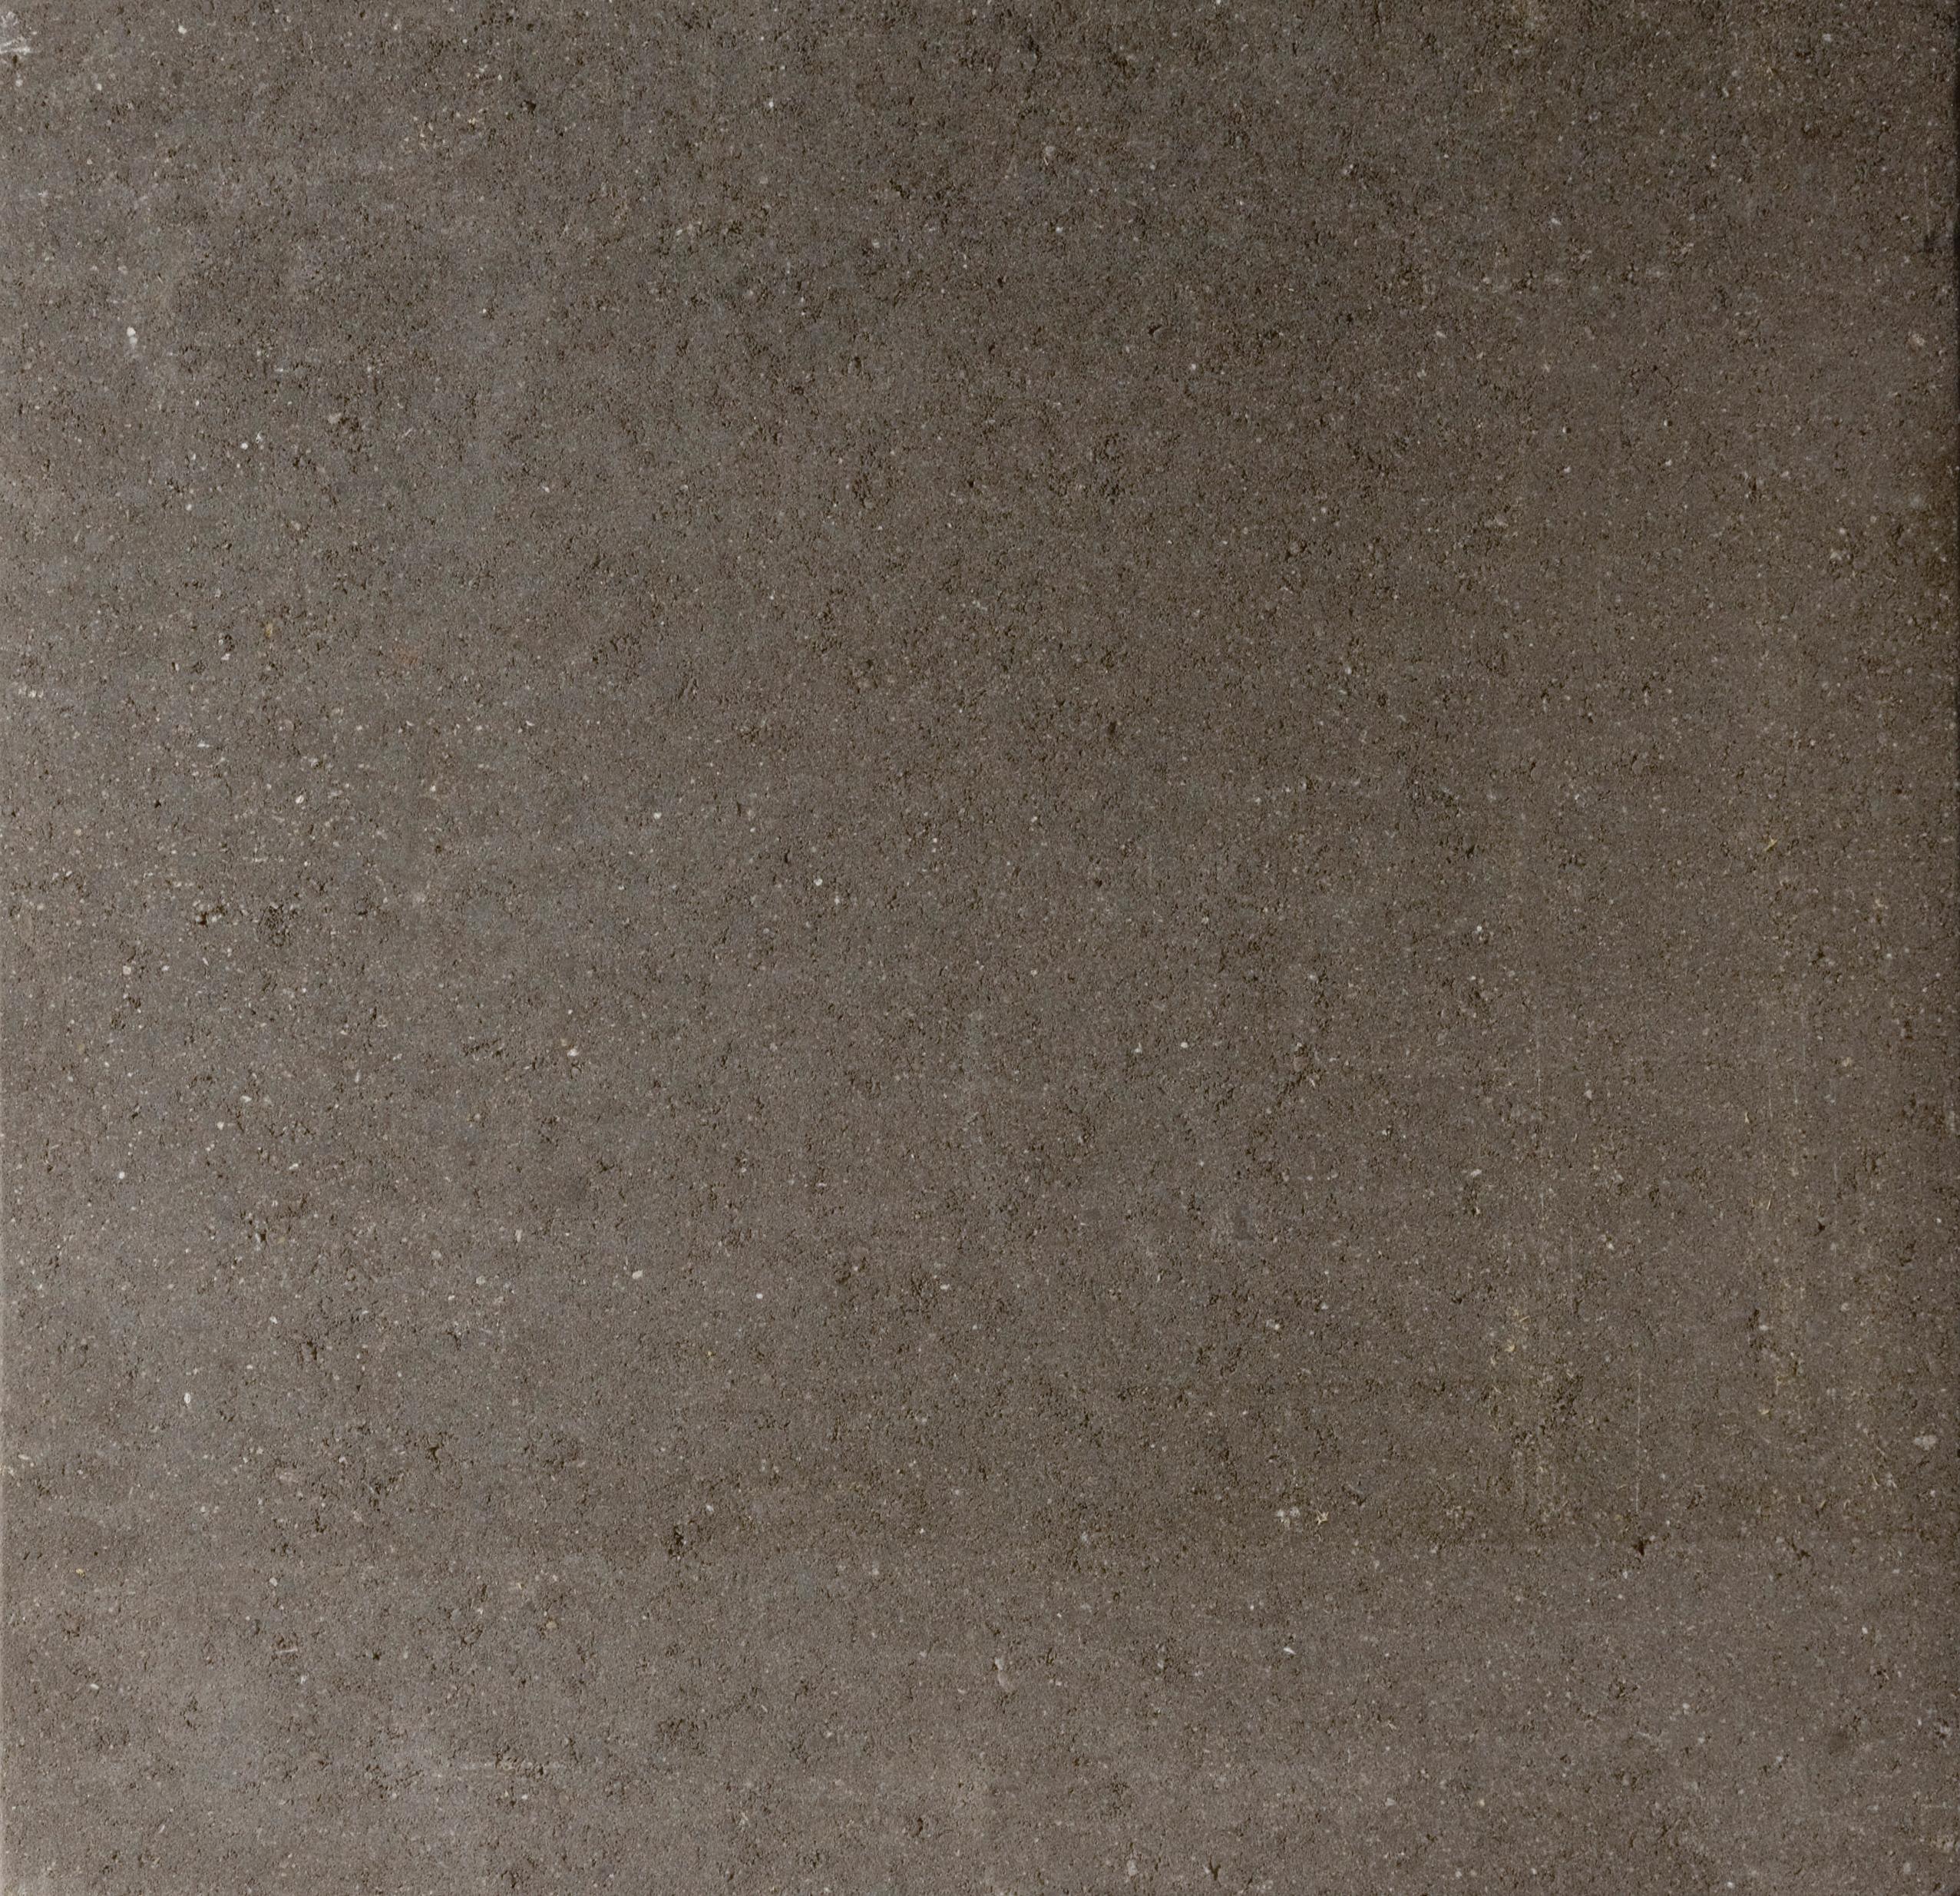 Pedra Paving Flag Smooth Slate 400x400x40mm (Bevel Edge)